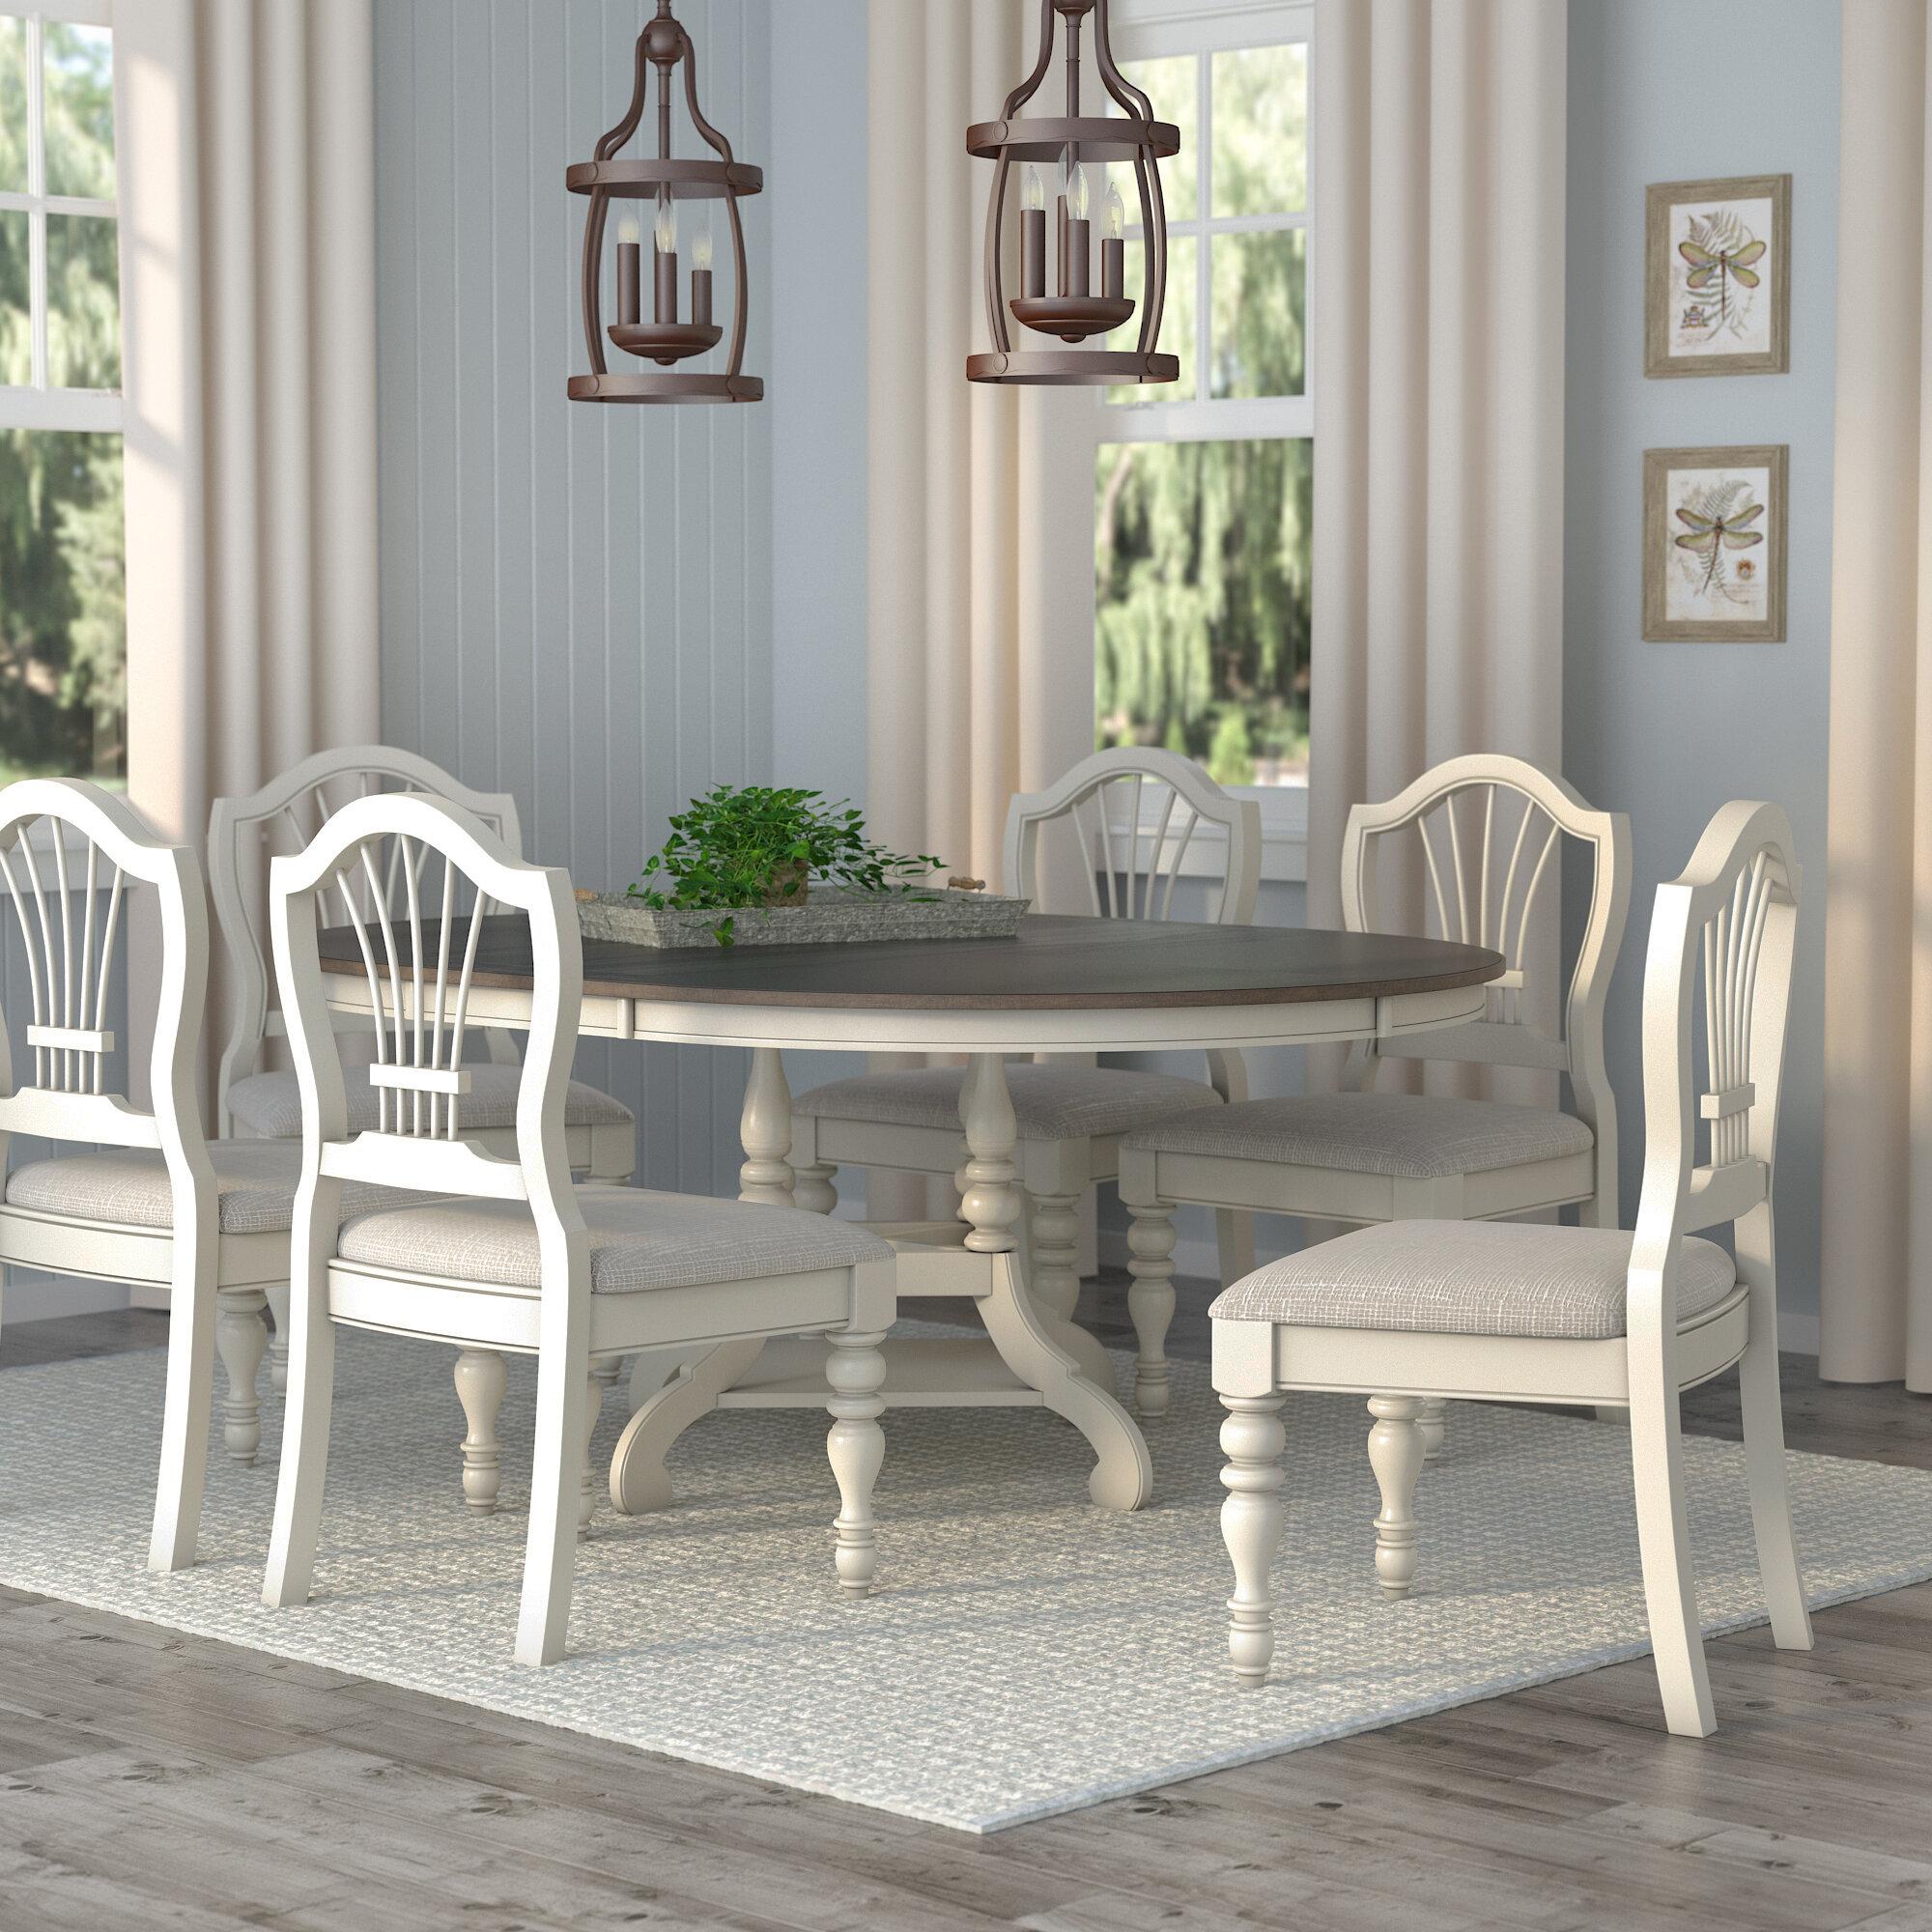 Lark Manor Alise 7 Piece Dining Set & Reviews   Wayfair